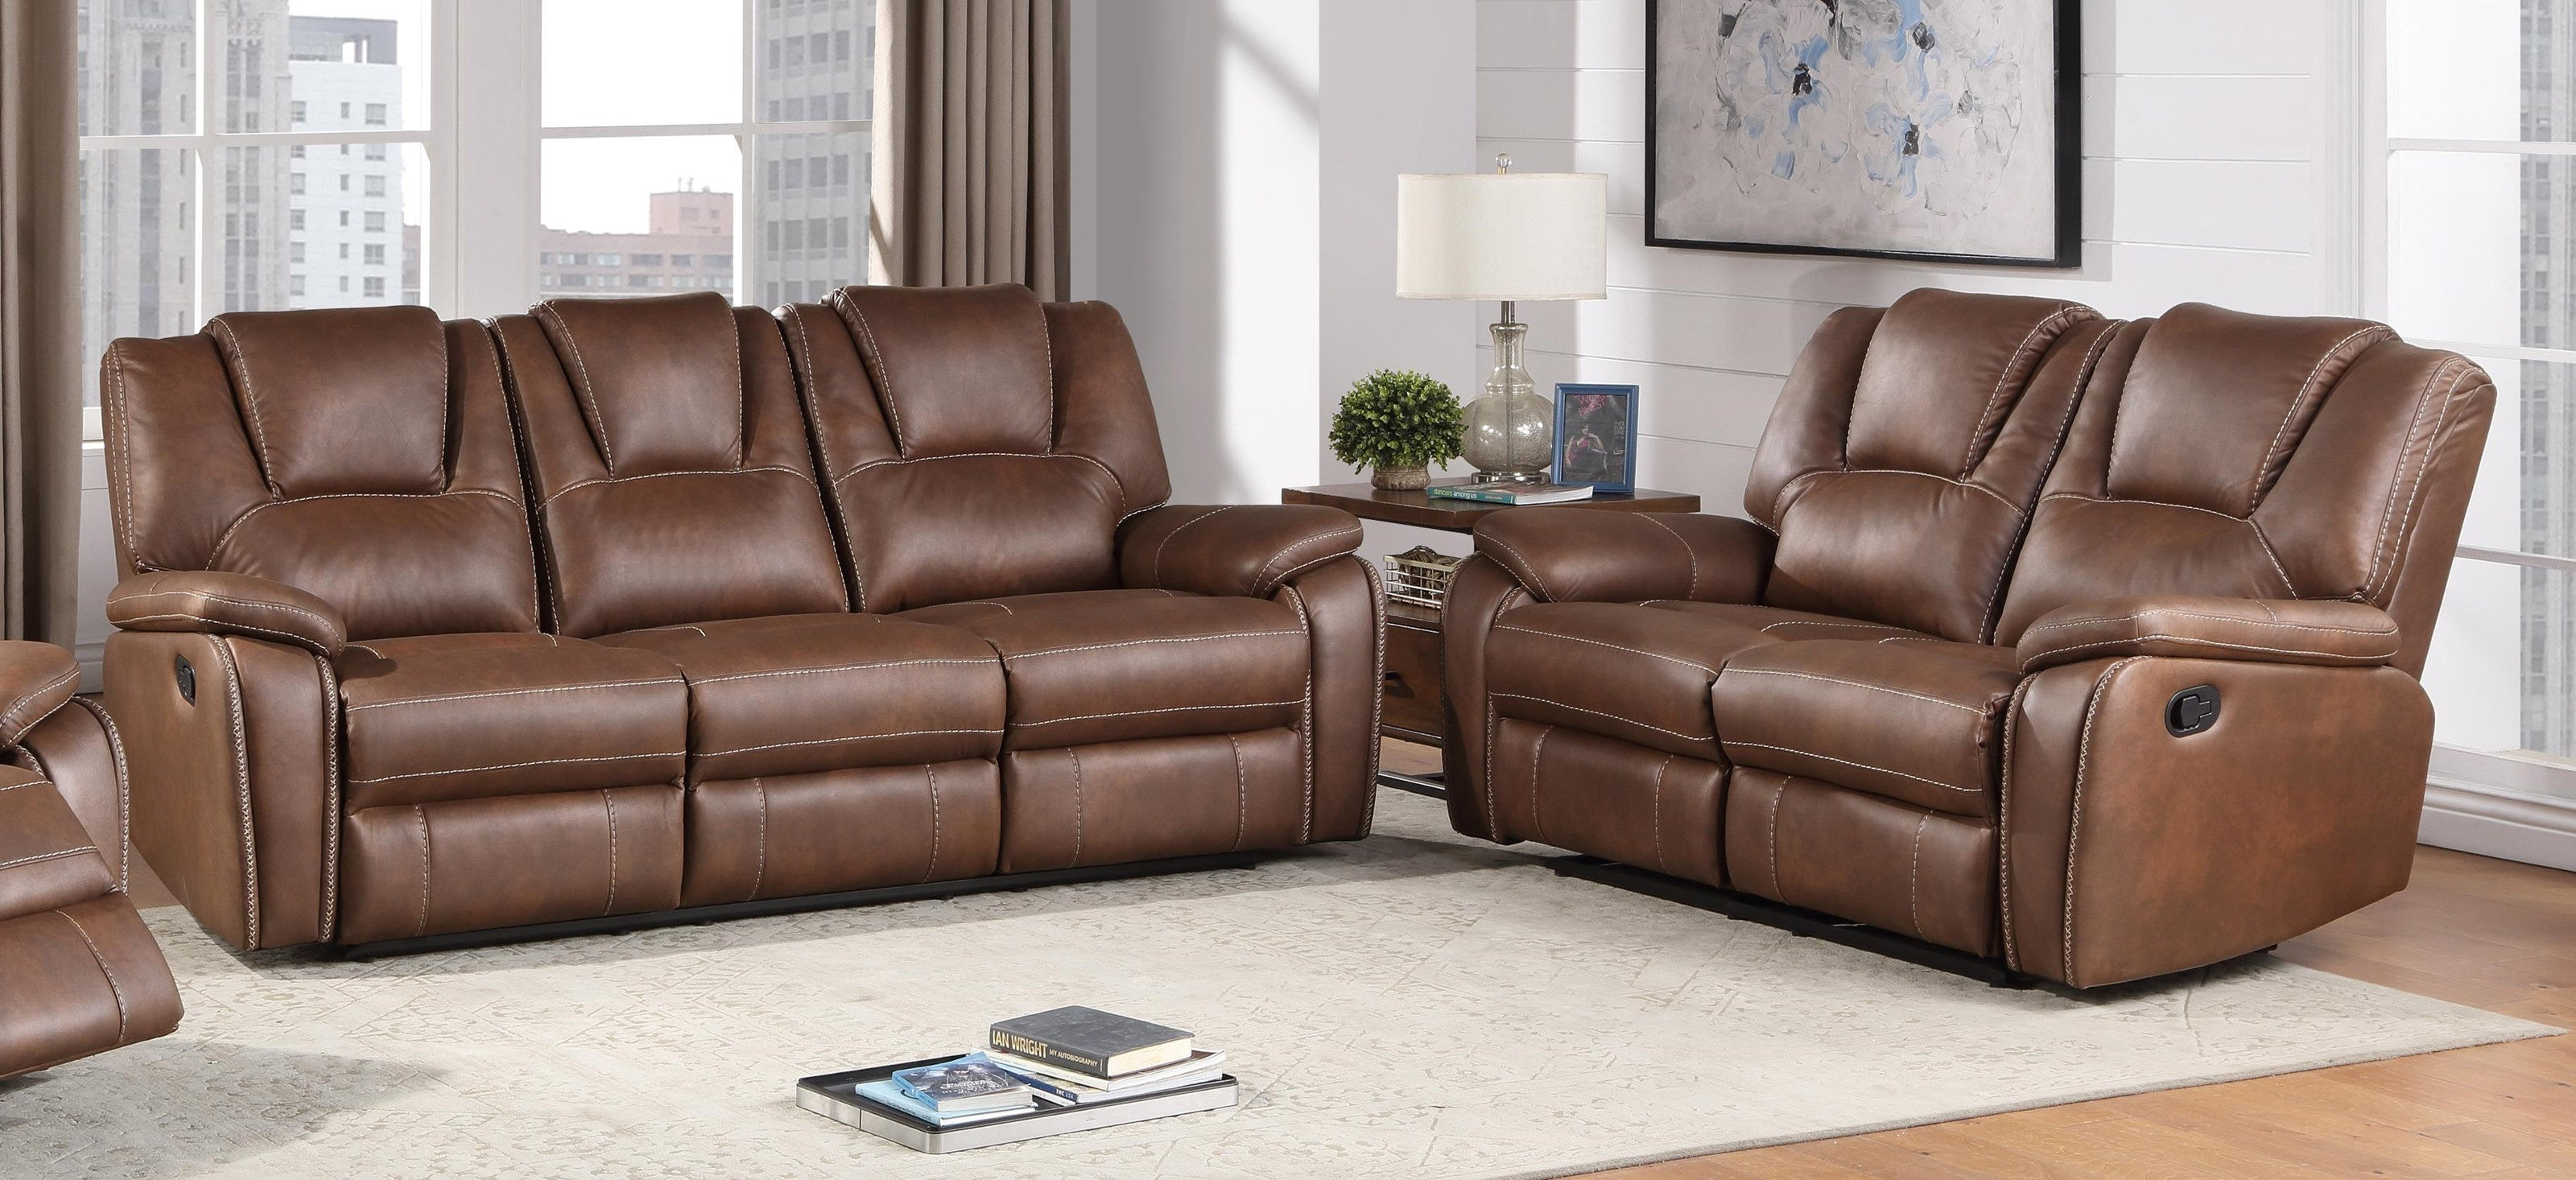 Picture of: Steve Silver Katrine Kt800sb Lb Reclining Sofa And Loveseat Set Sam Levitz Furniture Reclining Living Room Groups